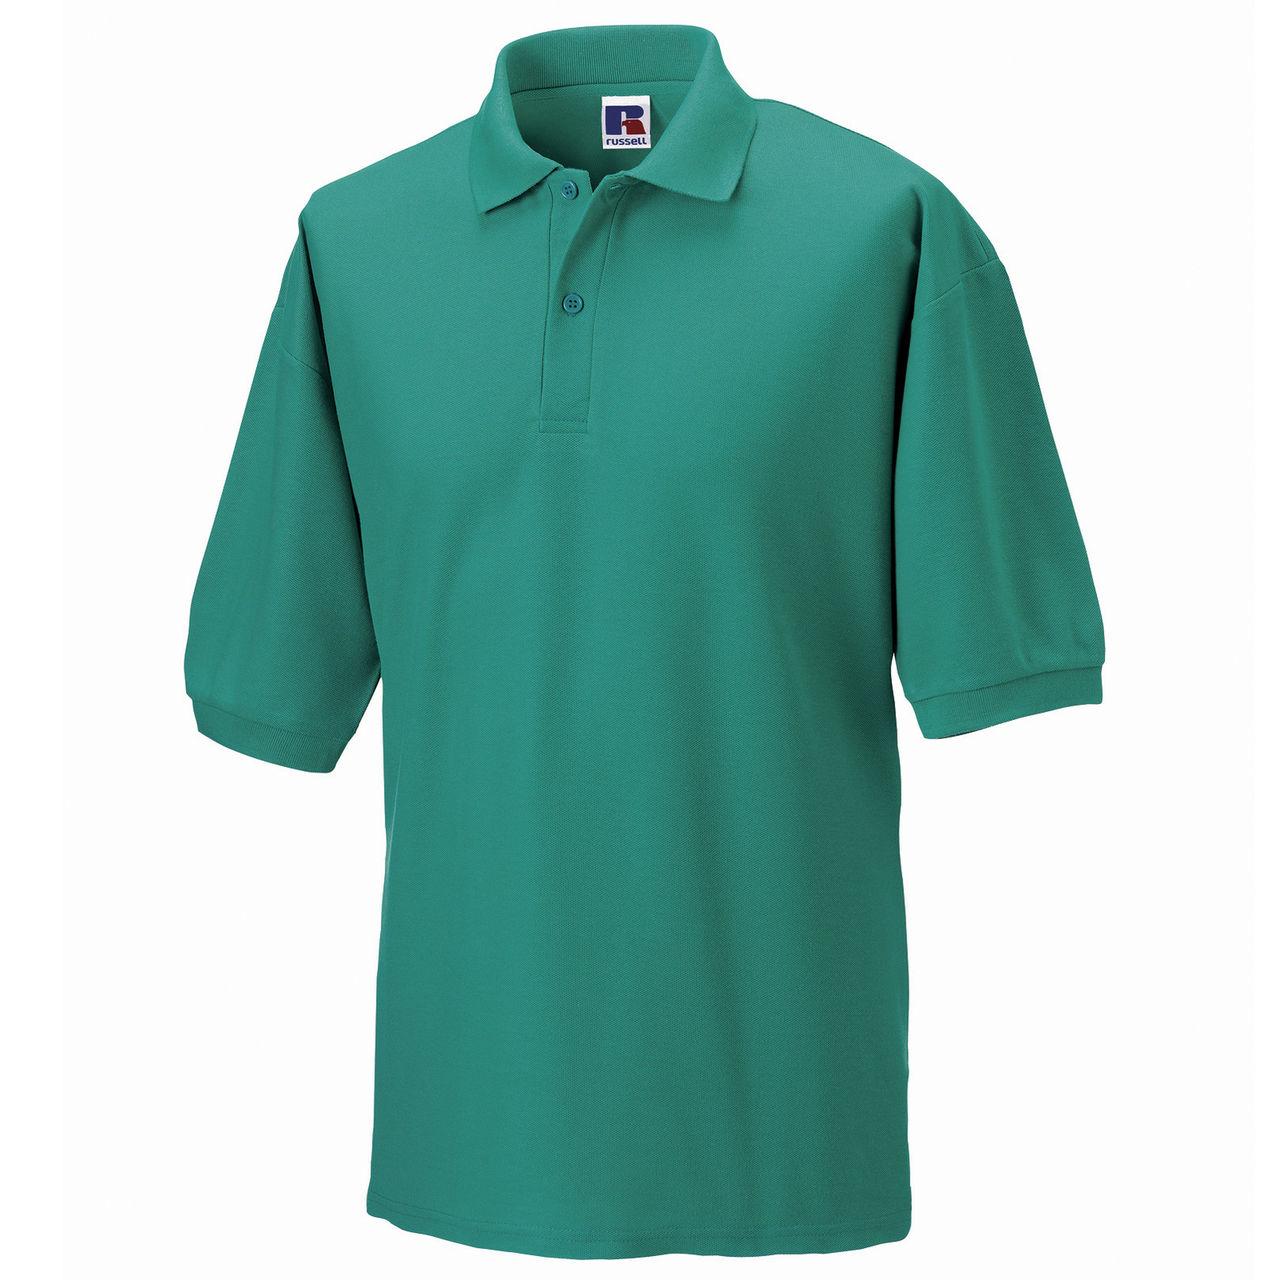 292898aade9 Gucci Mens Dress Shirt Ebay